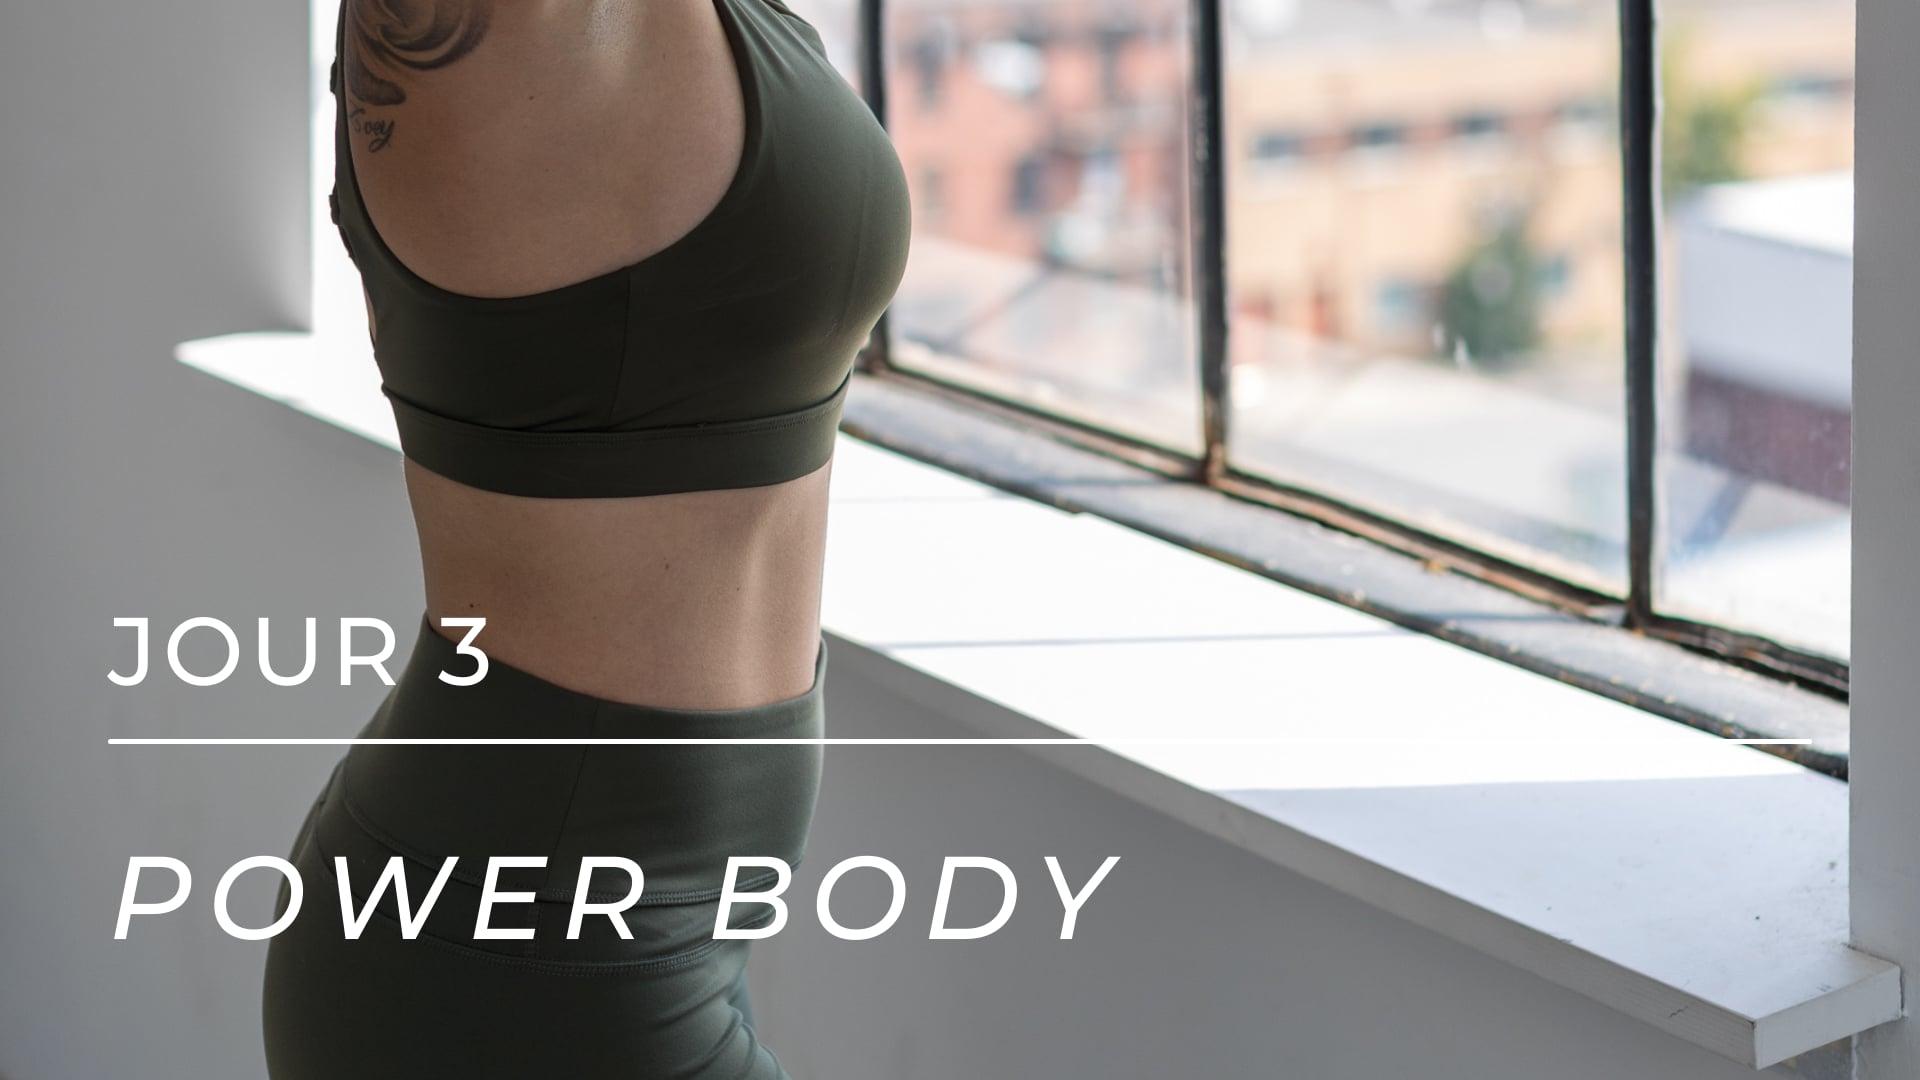 POWER BODY - Jour 3